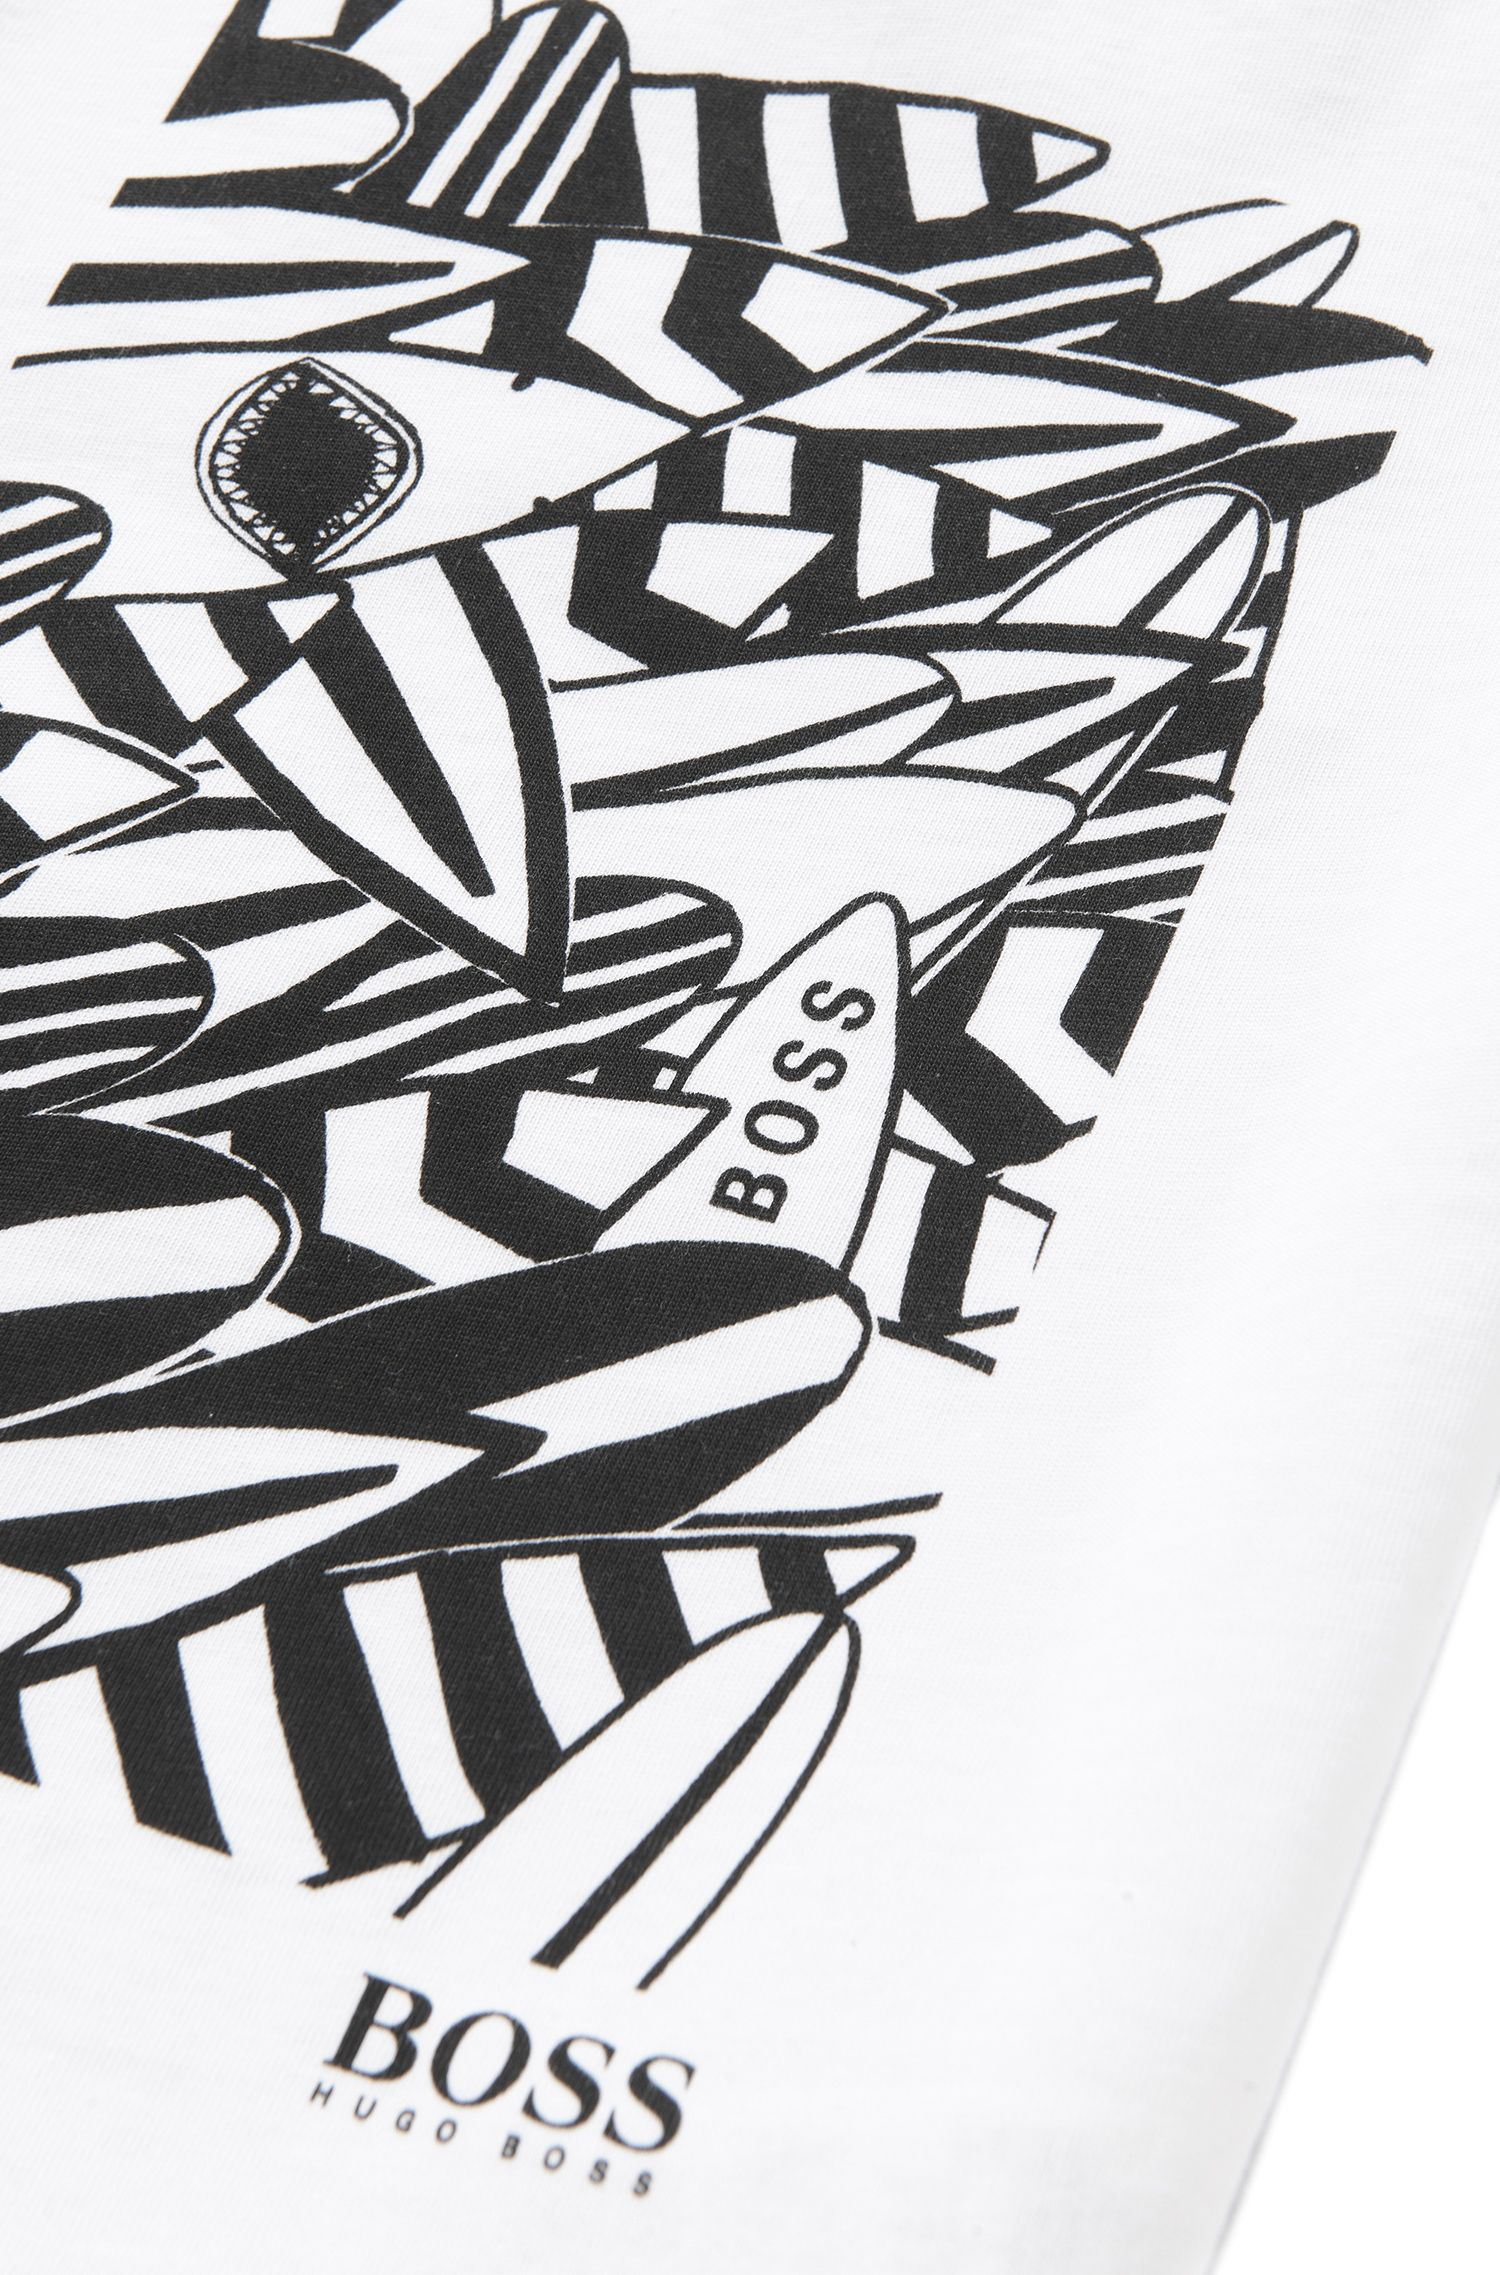 Bedrucktes Kids-T-Shirt aus Baumwolle: 'J25939'